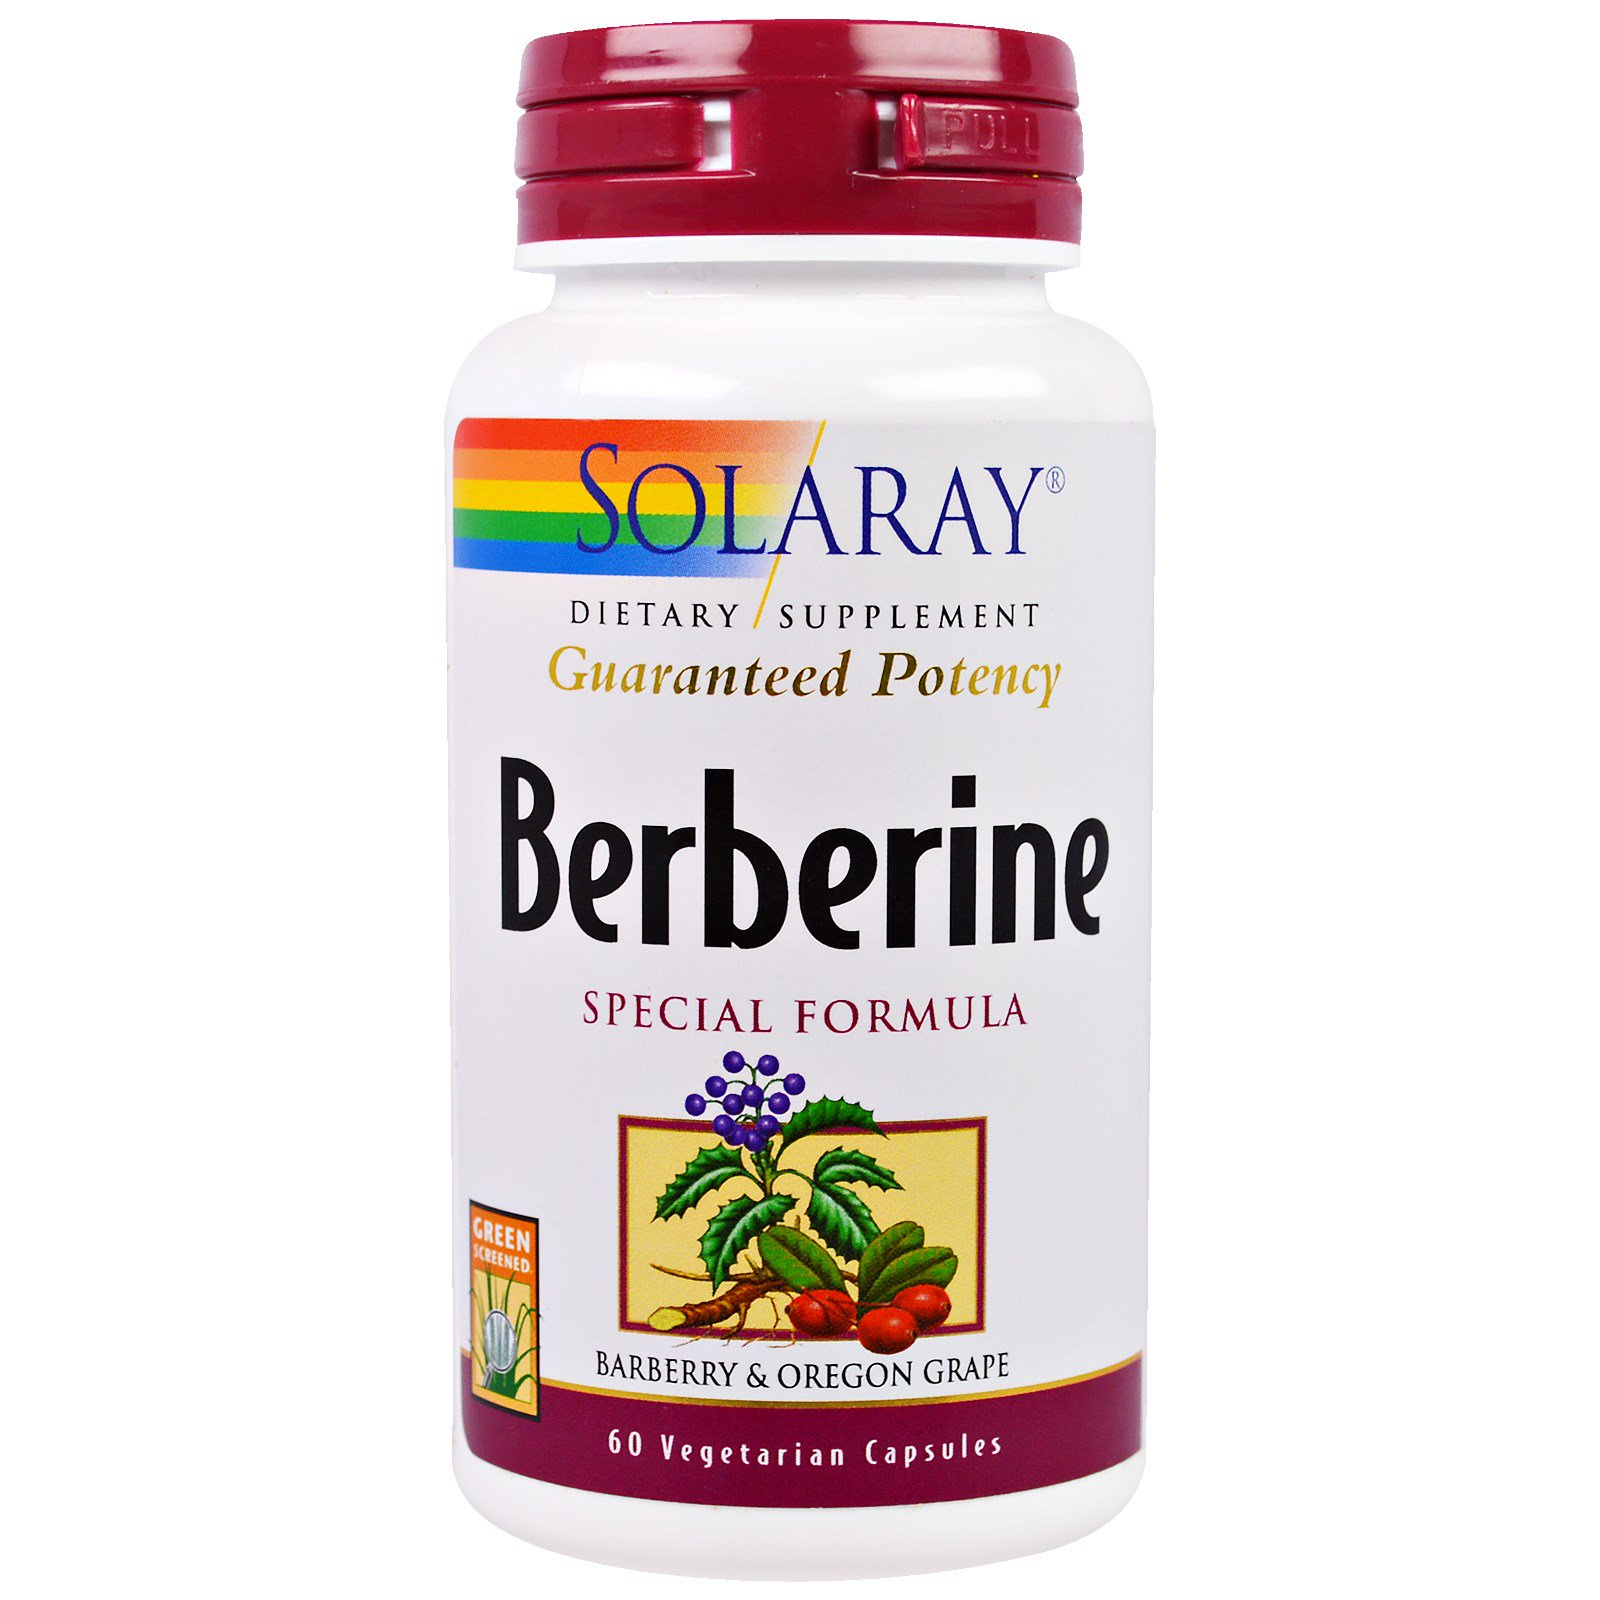 Solaray, Berberine Special Formula, 60 Veggie Capsules